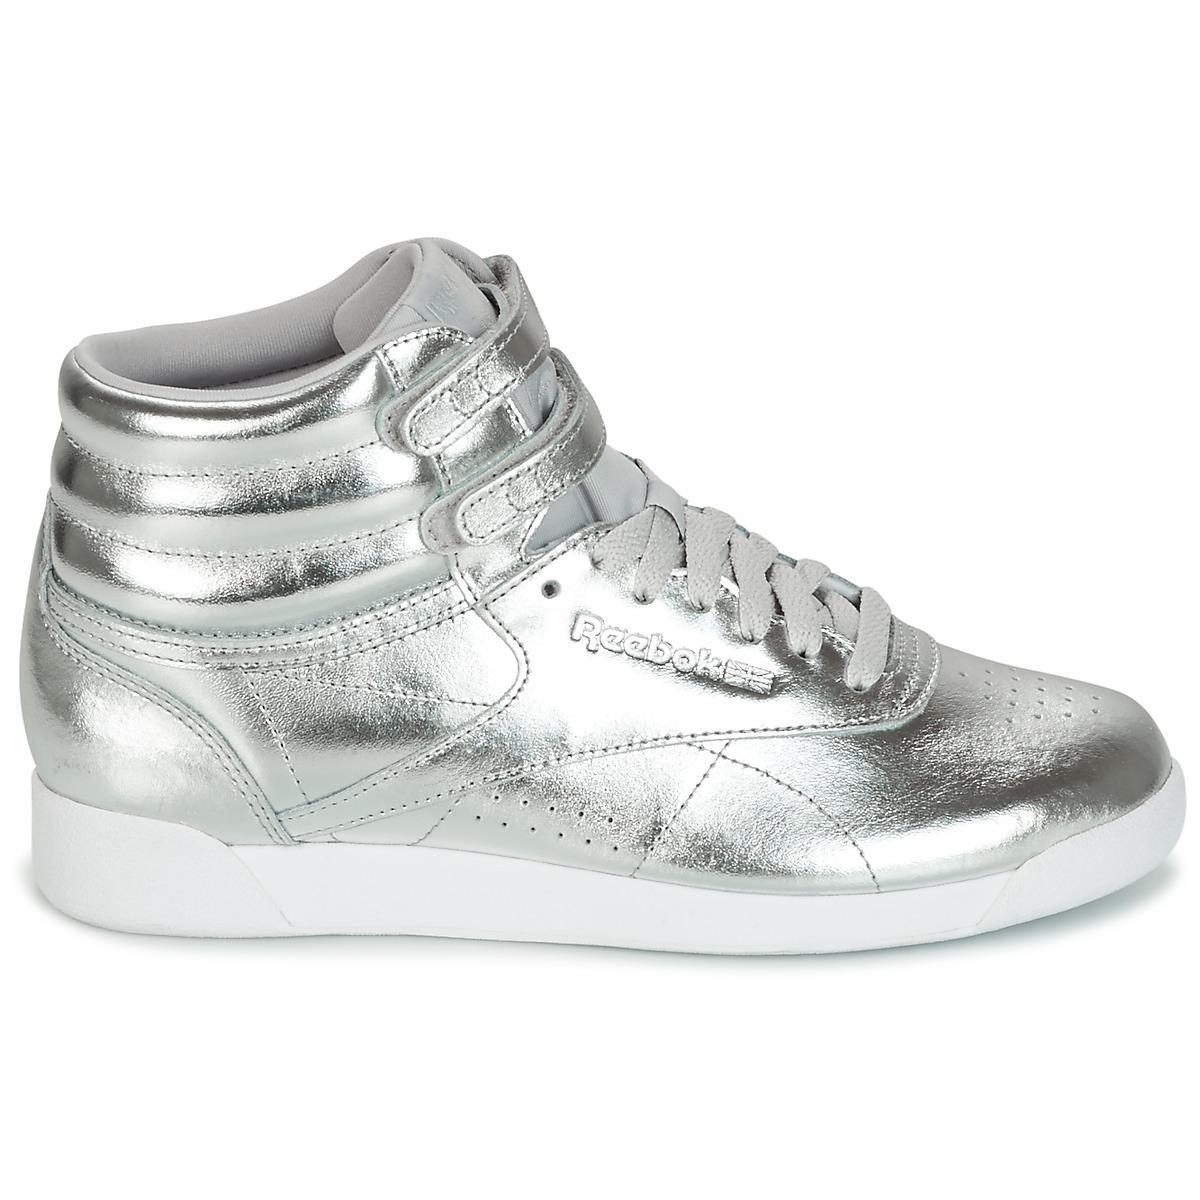 d1f687df8c5114 Reebok - F s Hi Metallic Women s Shoes (high-top Trainers) In. View  fullscreen